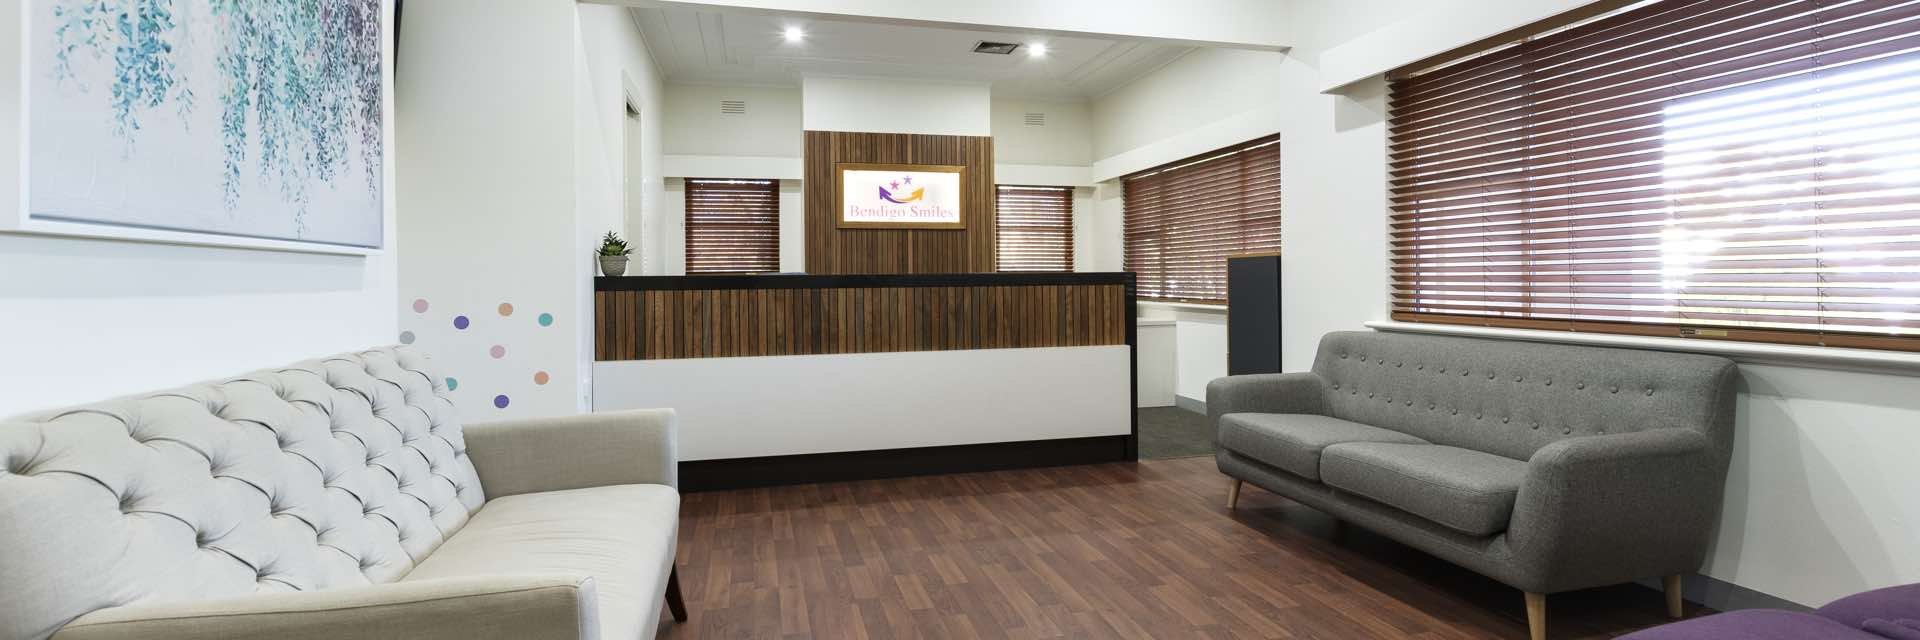 Bendigo Smiles Dentist - Reception Area / Waiting Room